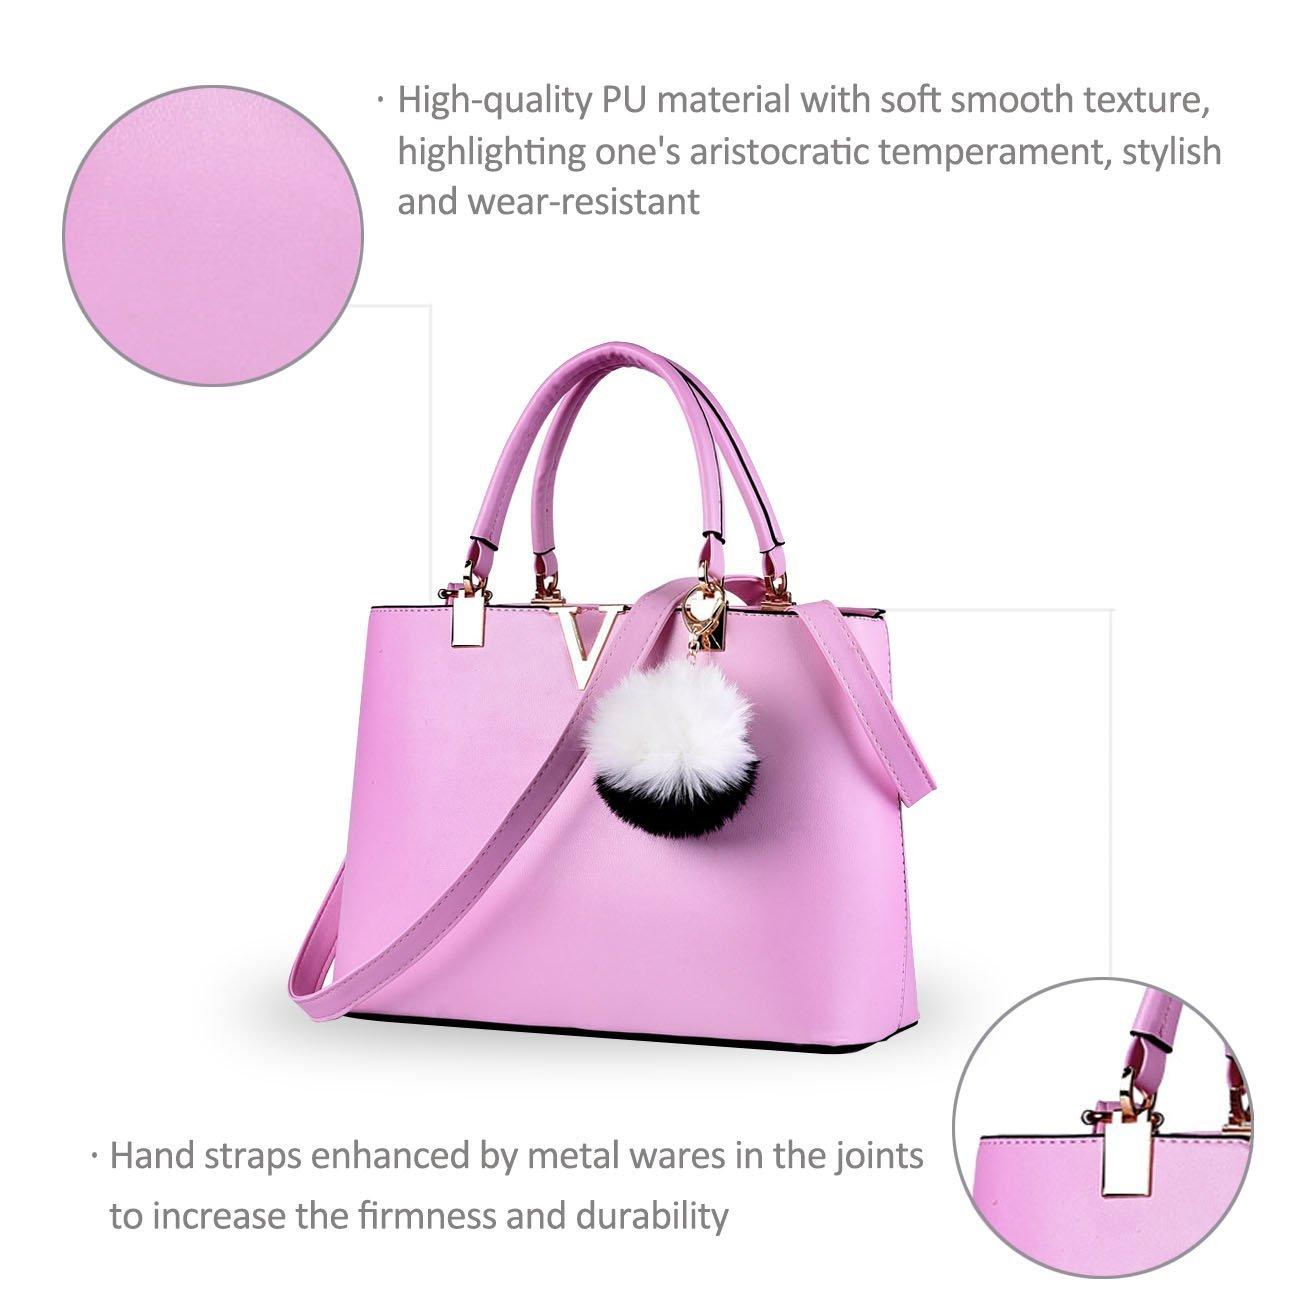 NICOLE & DORIS For Women's Casual Shoulder Cross Body Bags Spring 2017 Spring New Trends Minimal Fashion Handbags (Purple) by NICOLE & DORIS (Image #6)